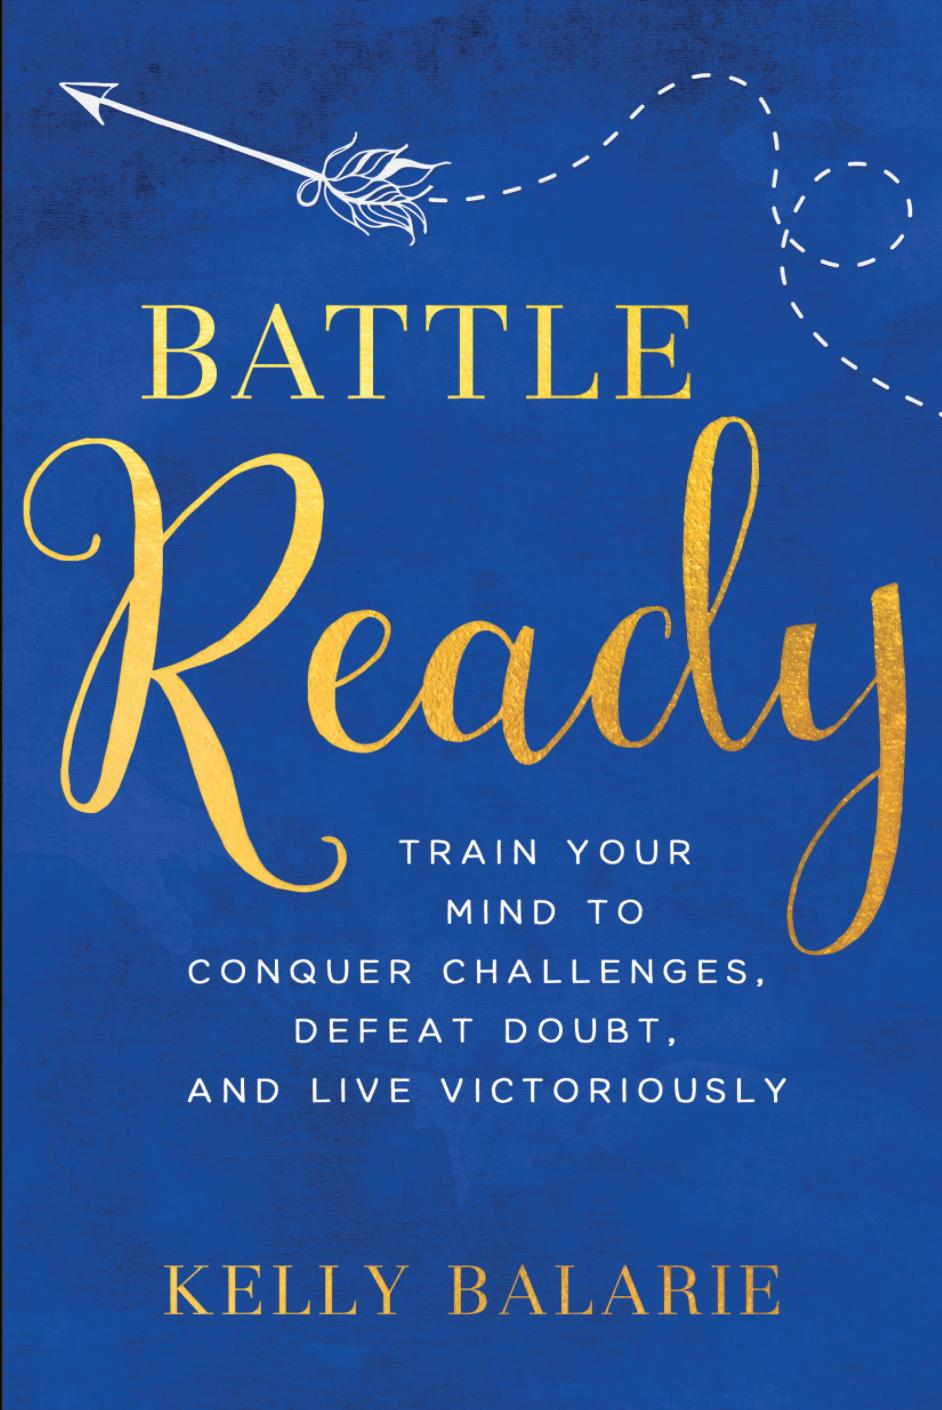 BattleReadyBookCover.png